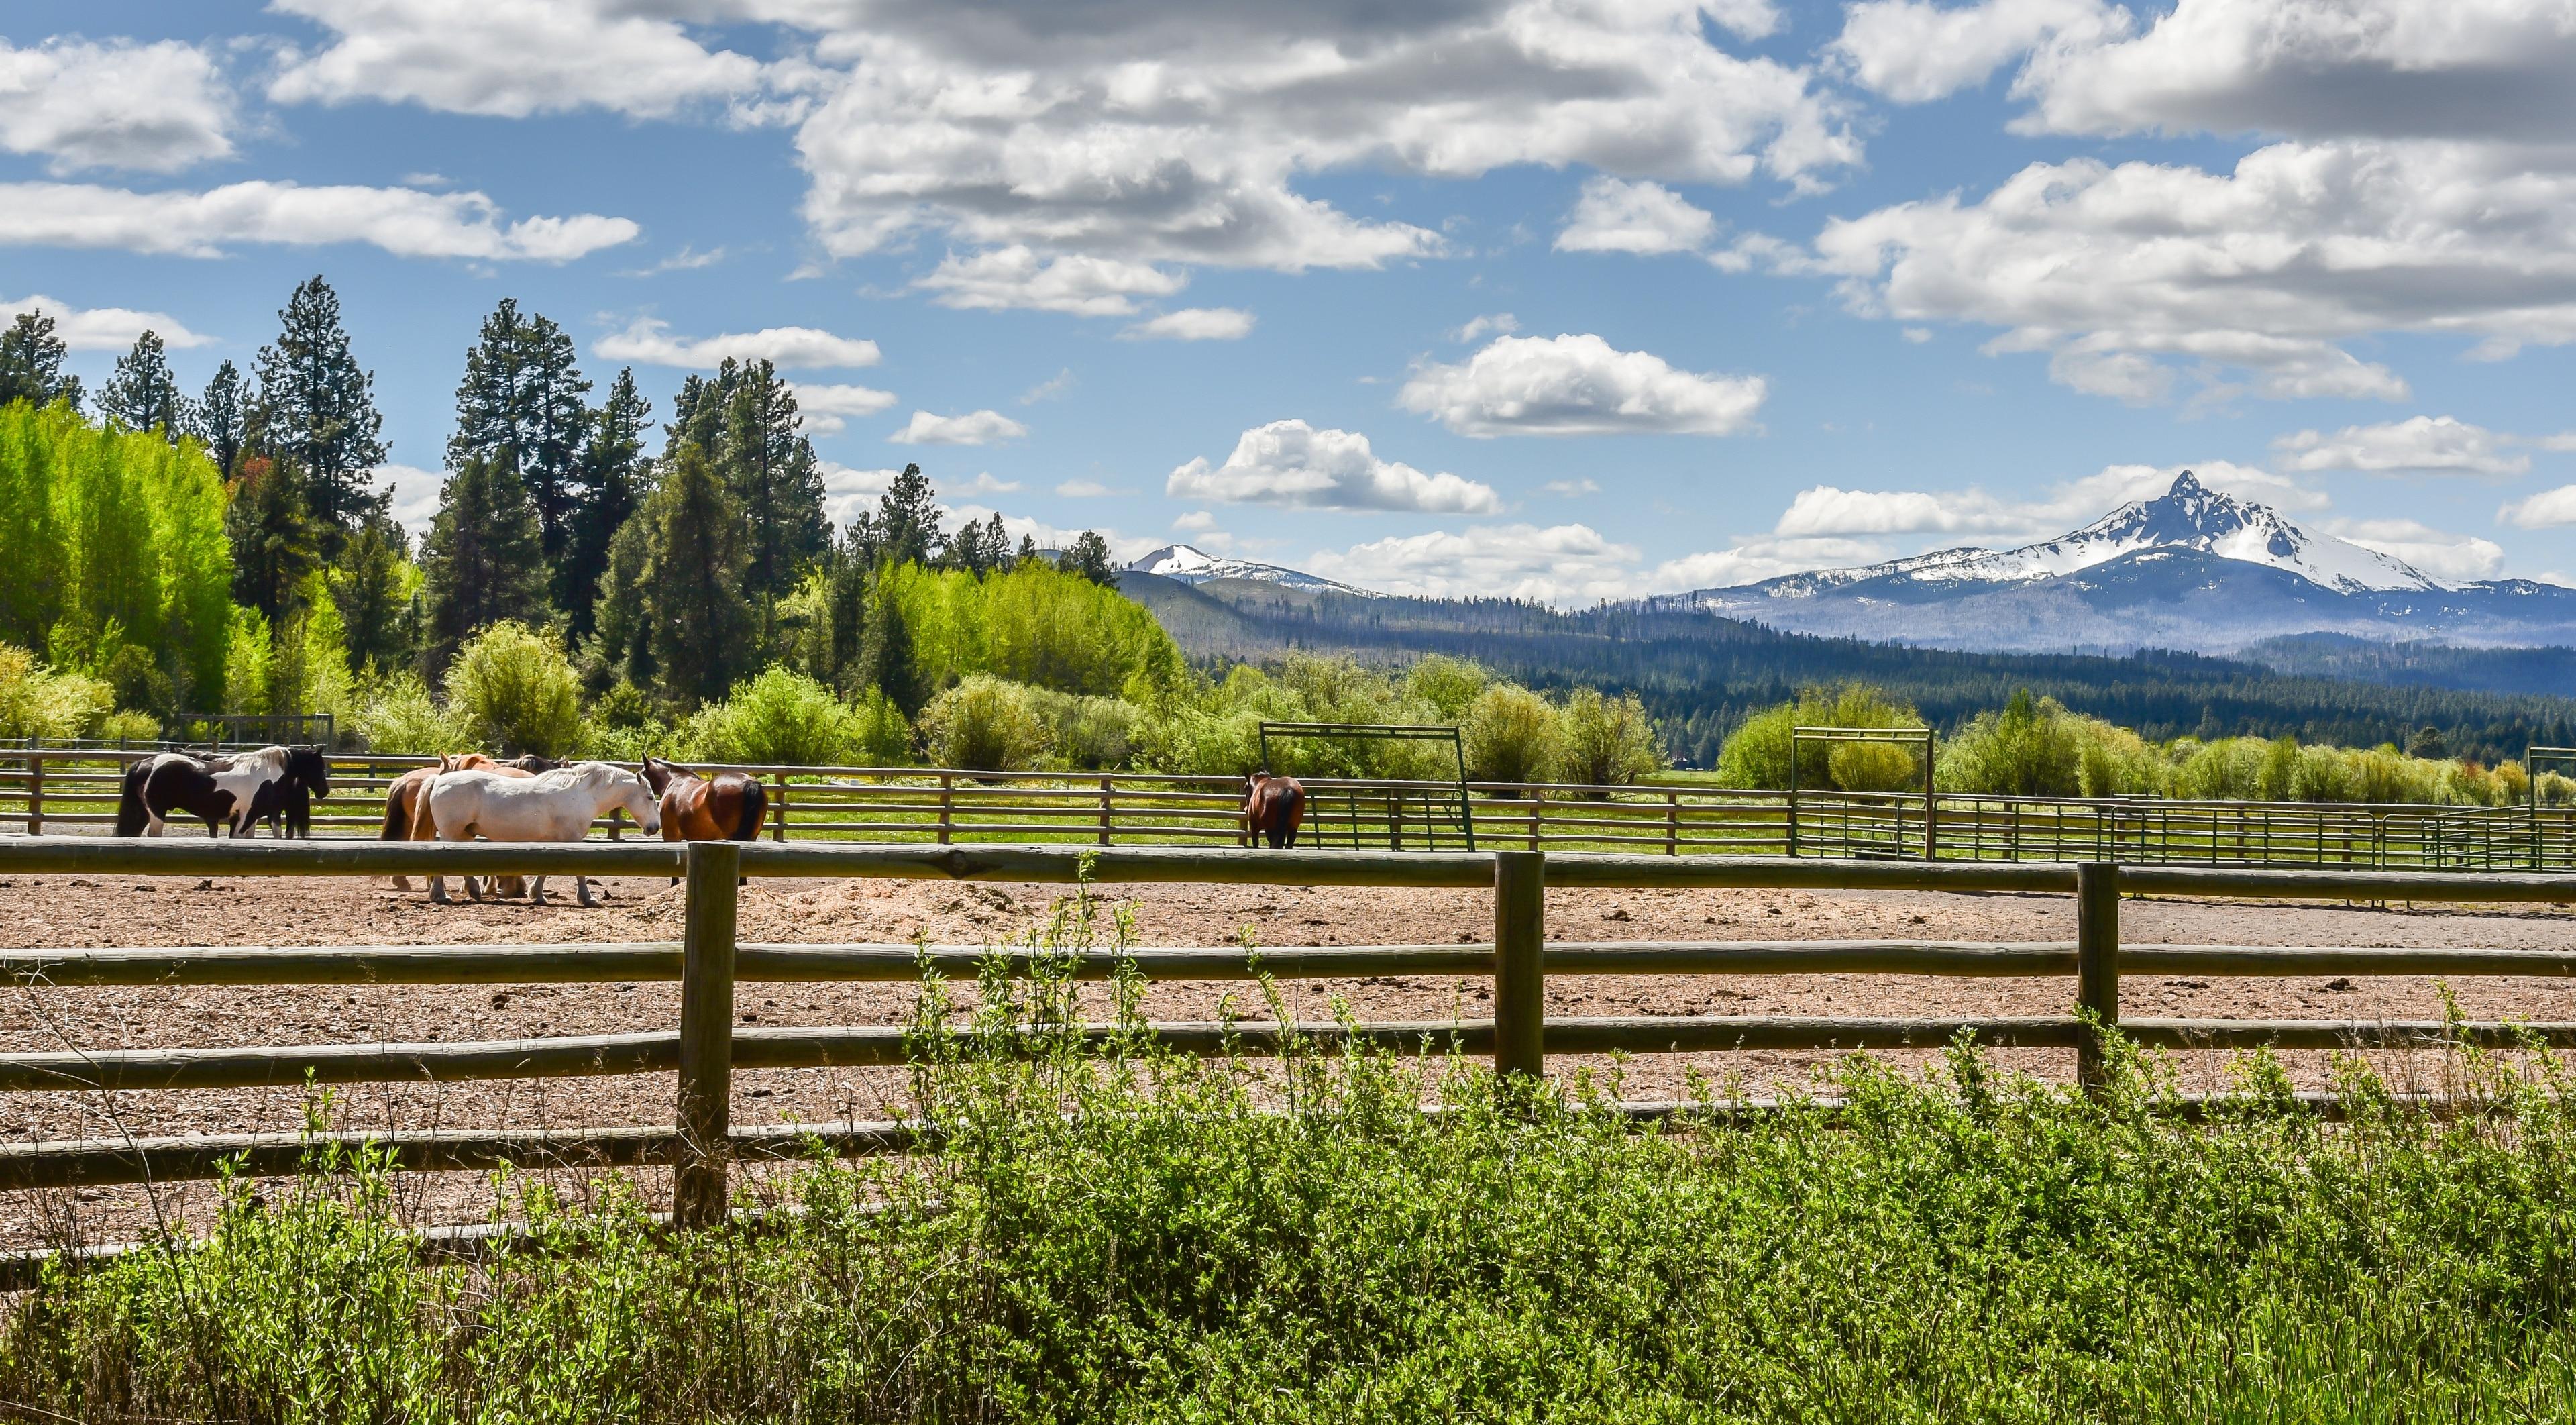 Sisters, Oregon, United States of America